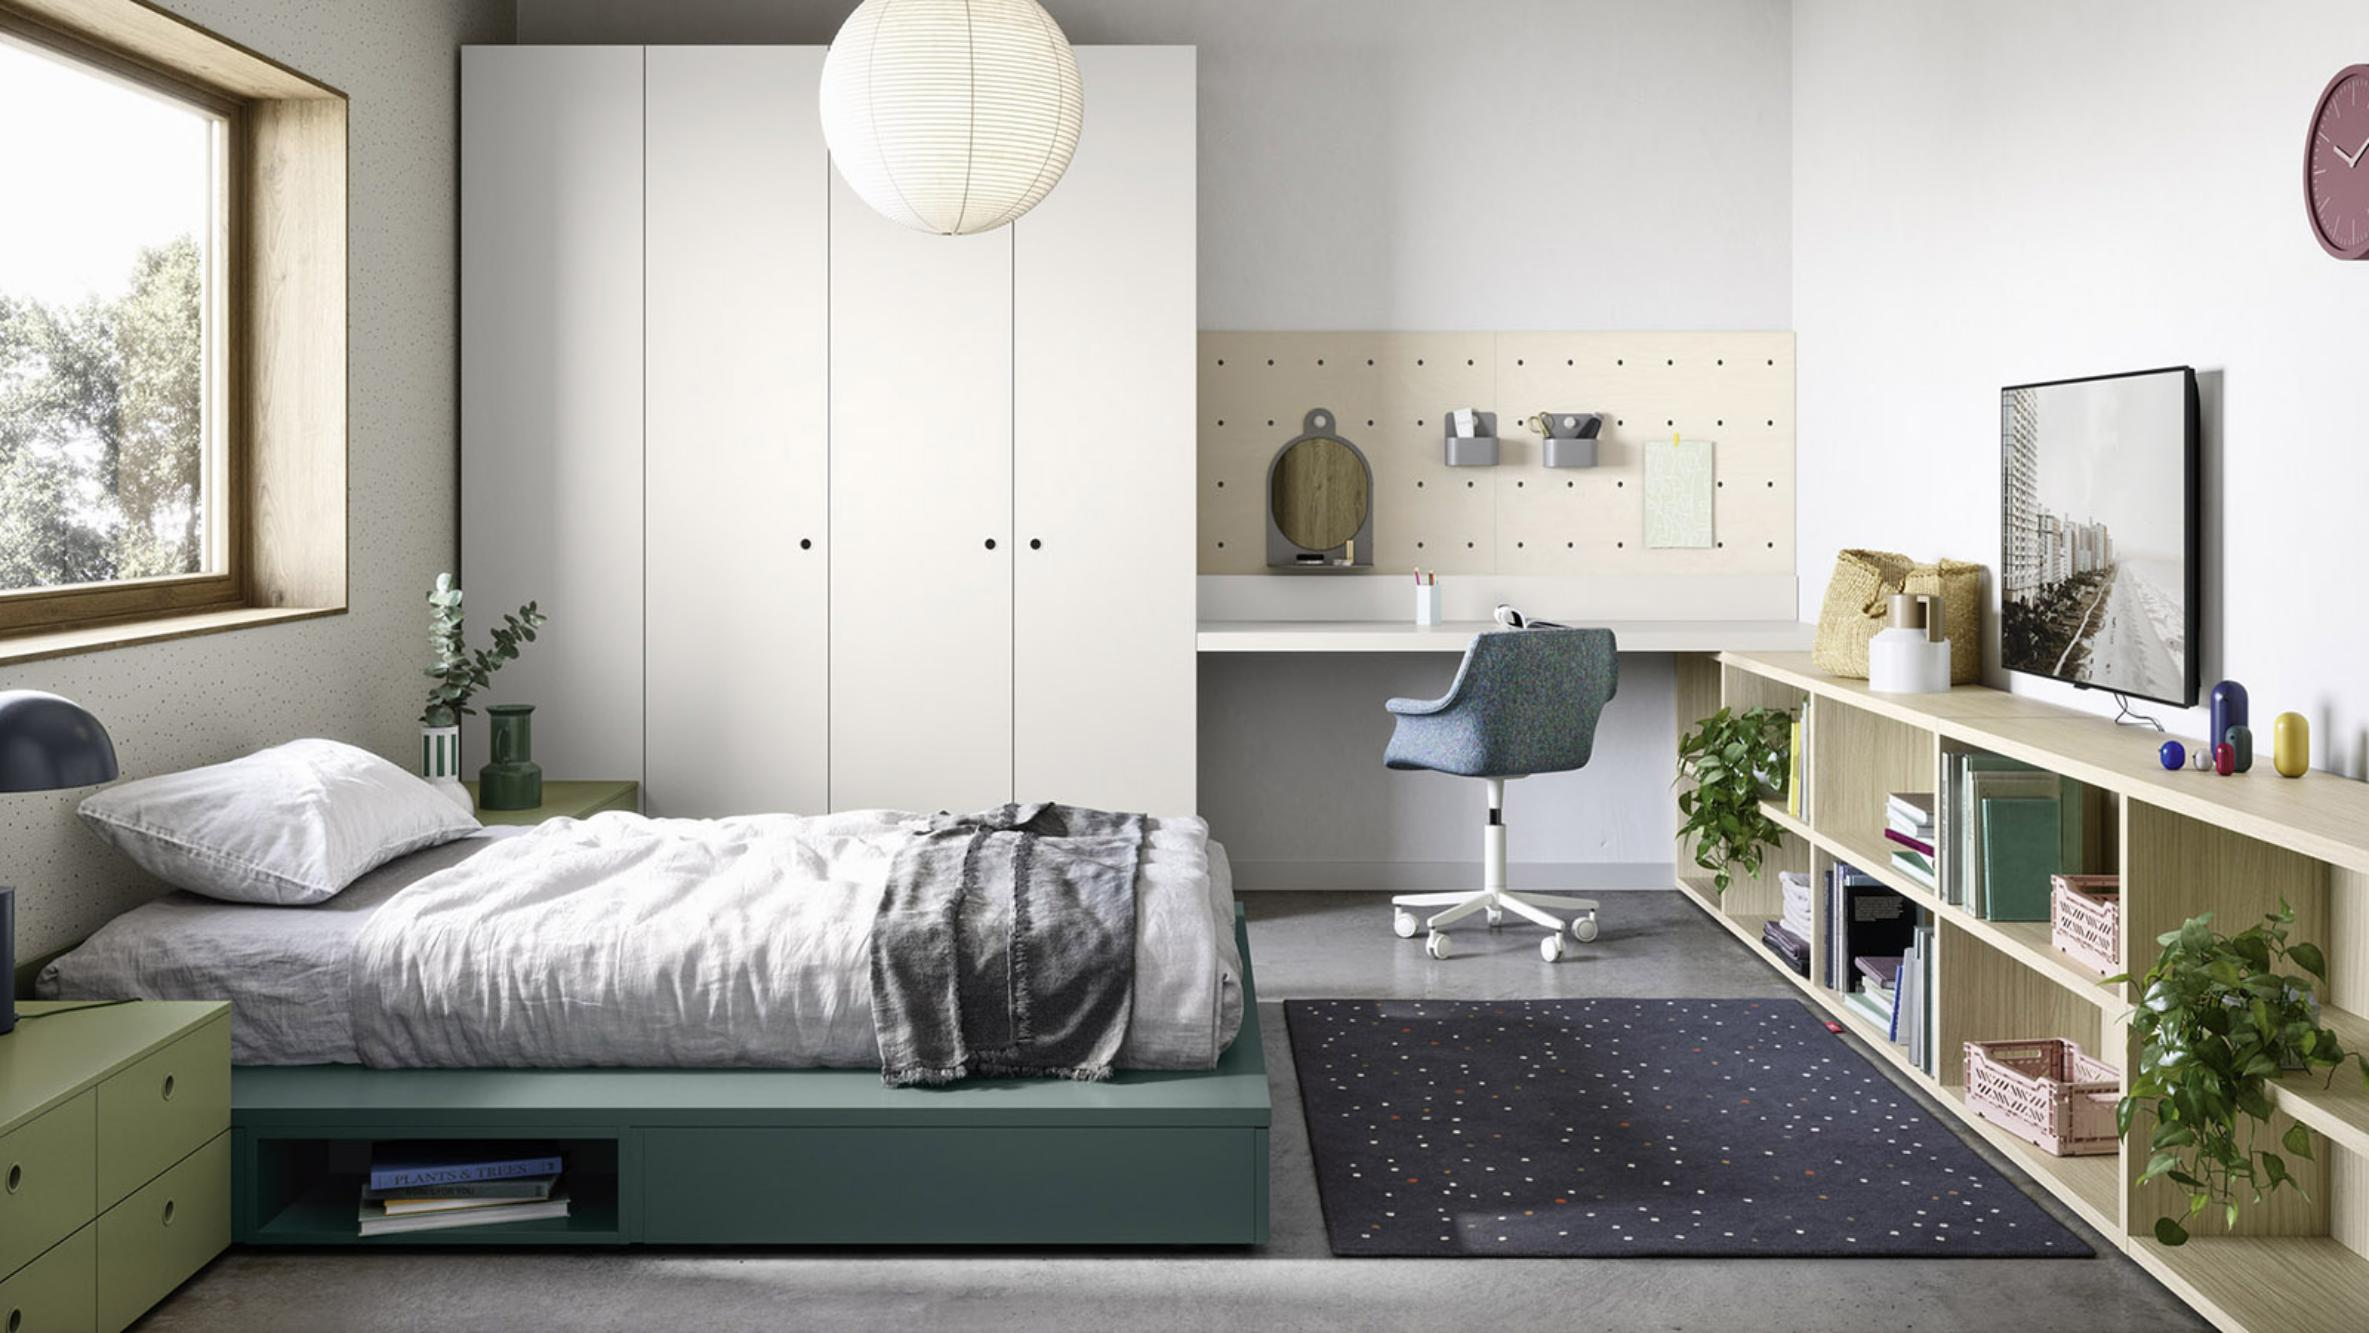 Camerette mobilificio Cominazzi Cavallirio - Novara